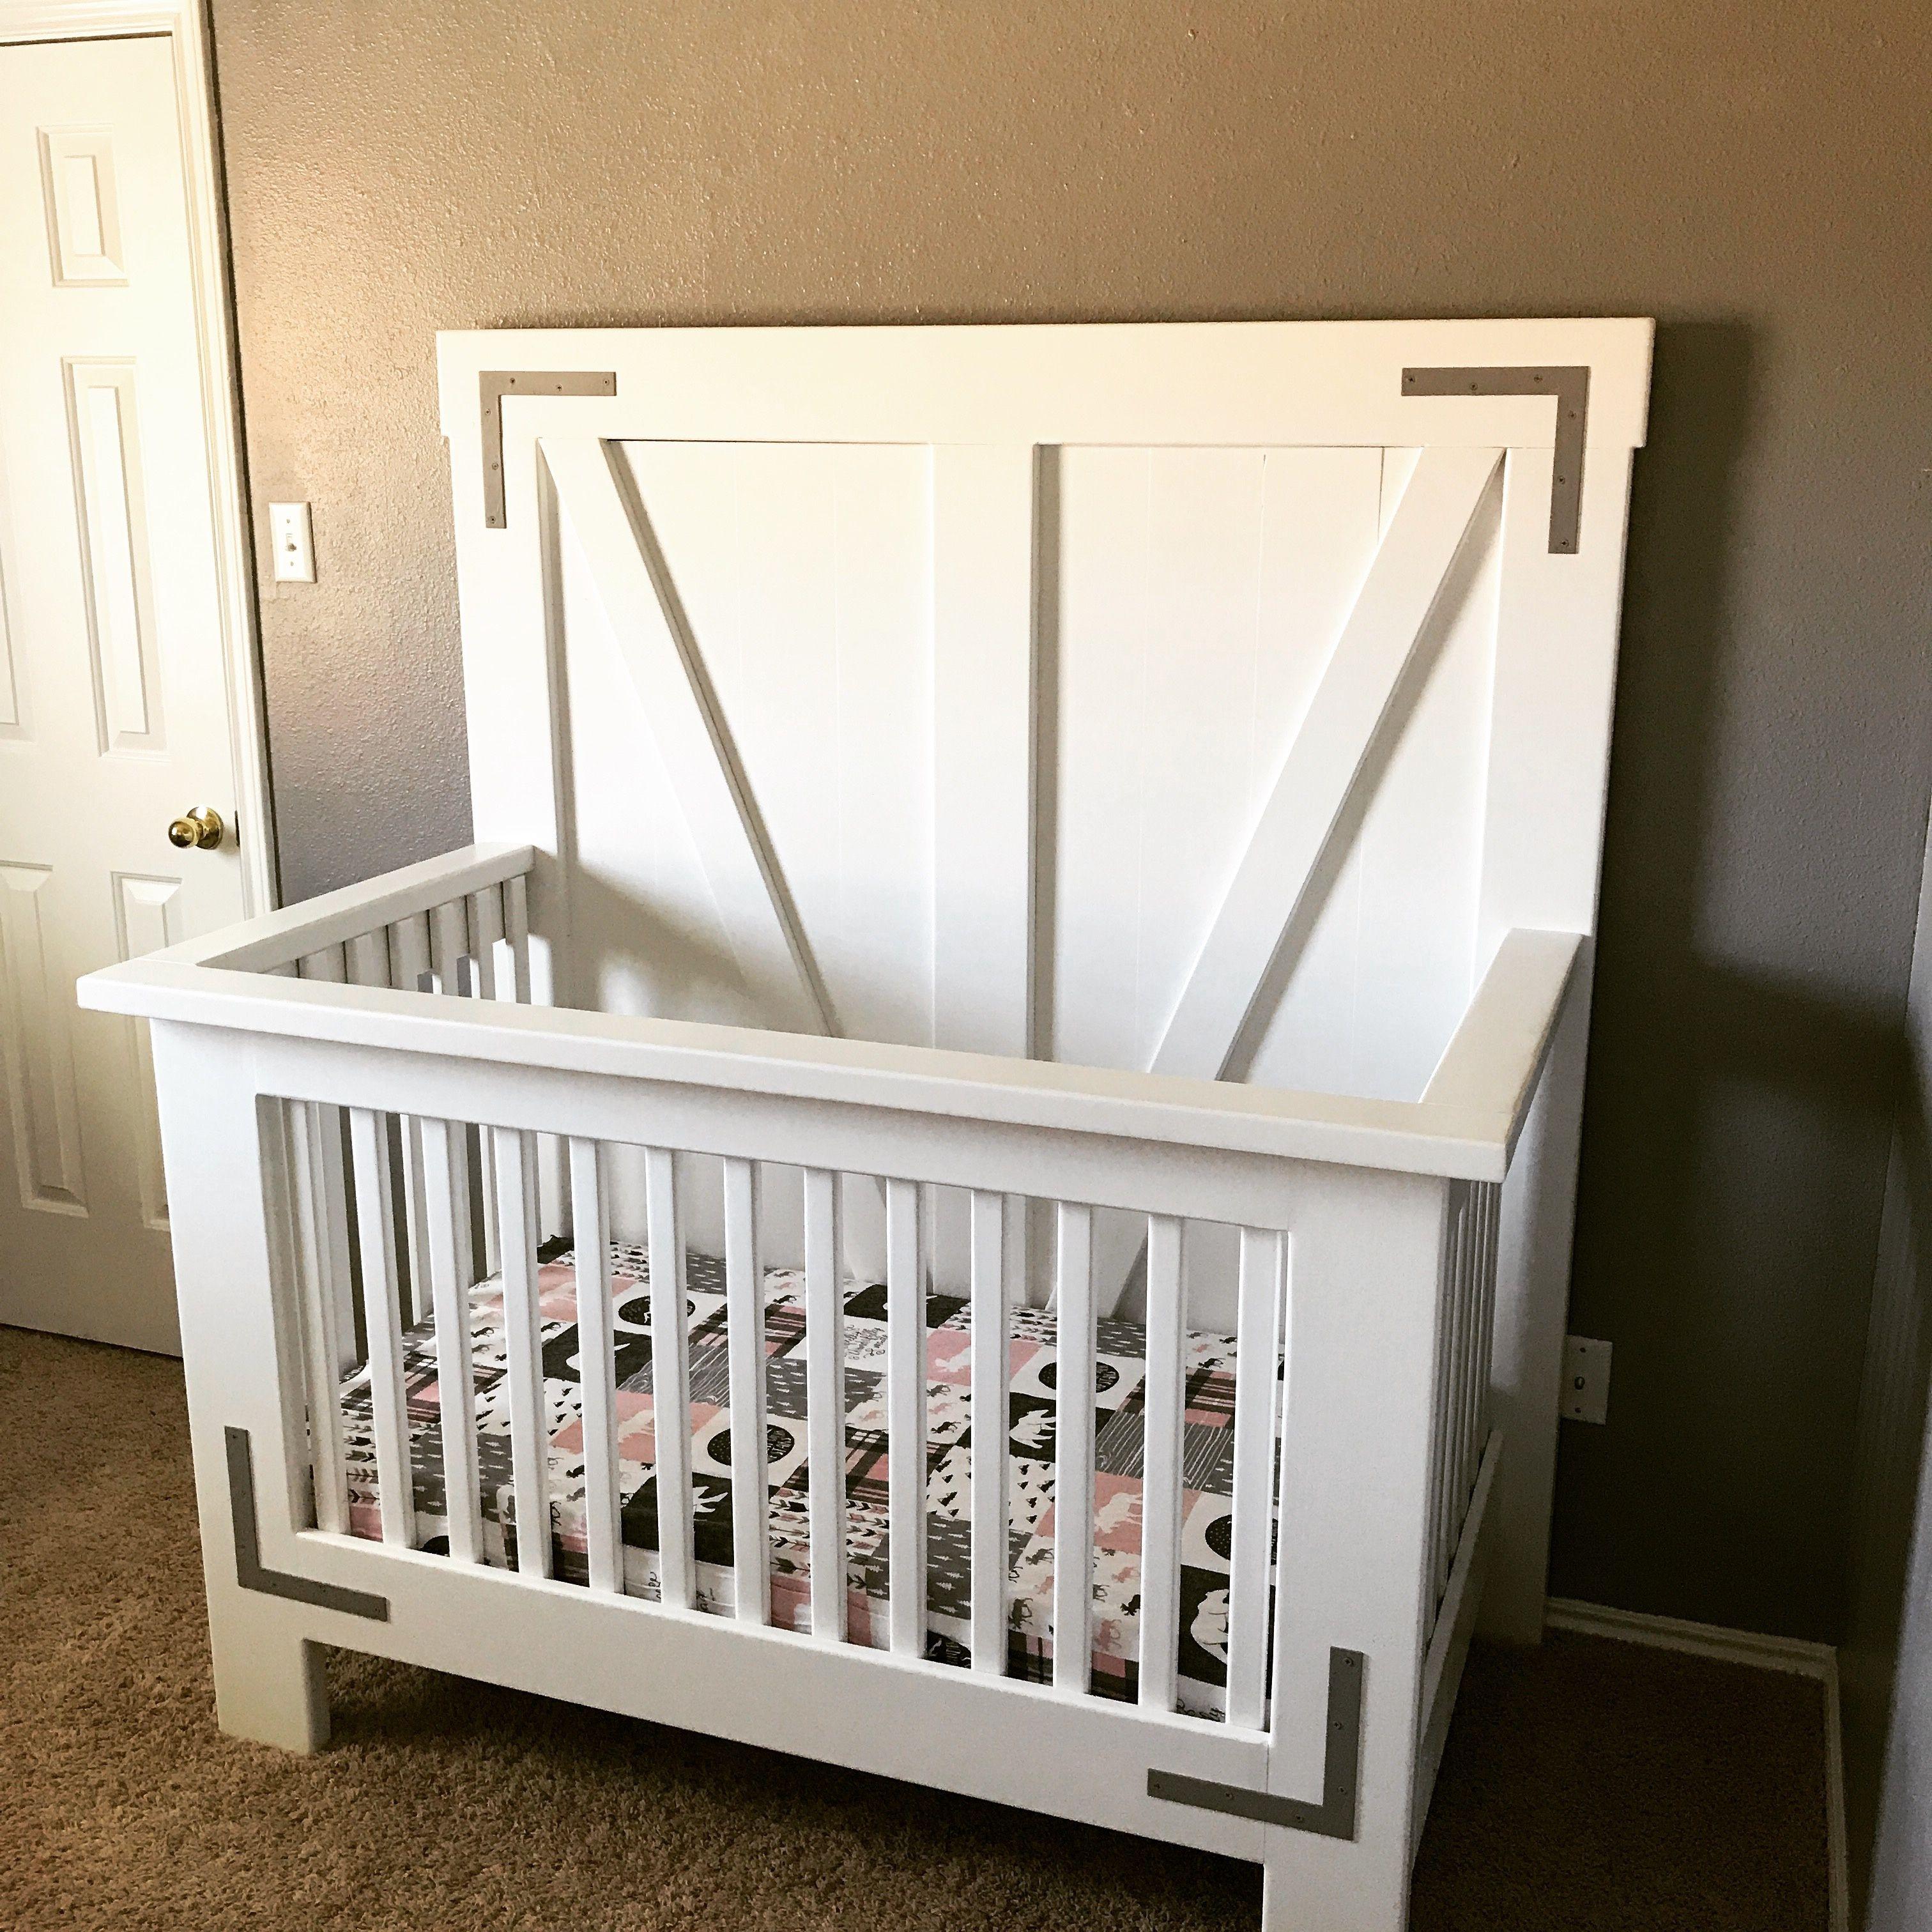 Diy Farmhouse Crib Free Tutorial And Plans Shanty 2 Chic Kids Rooms Diy Farmhouse Cribs Baby Crib Diy